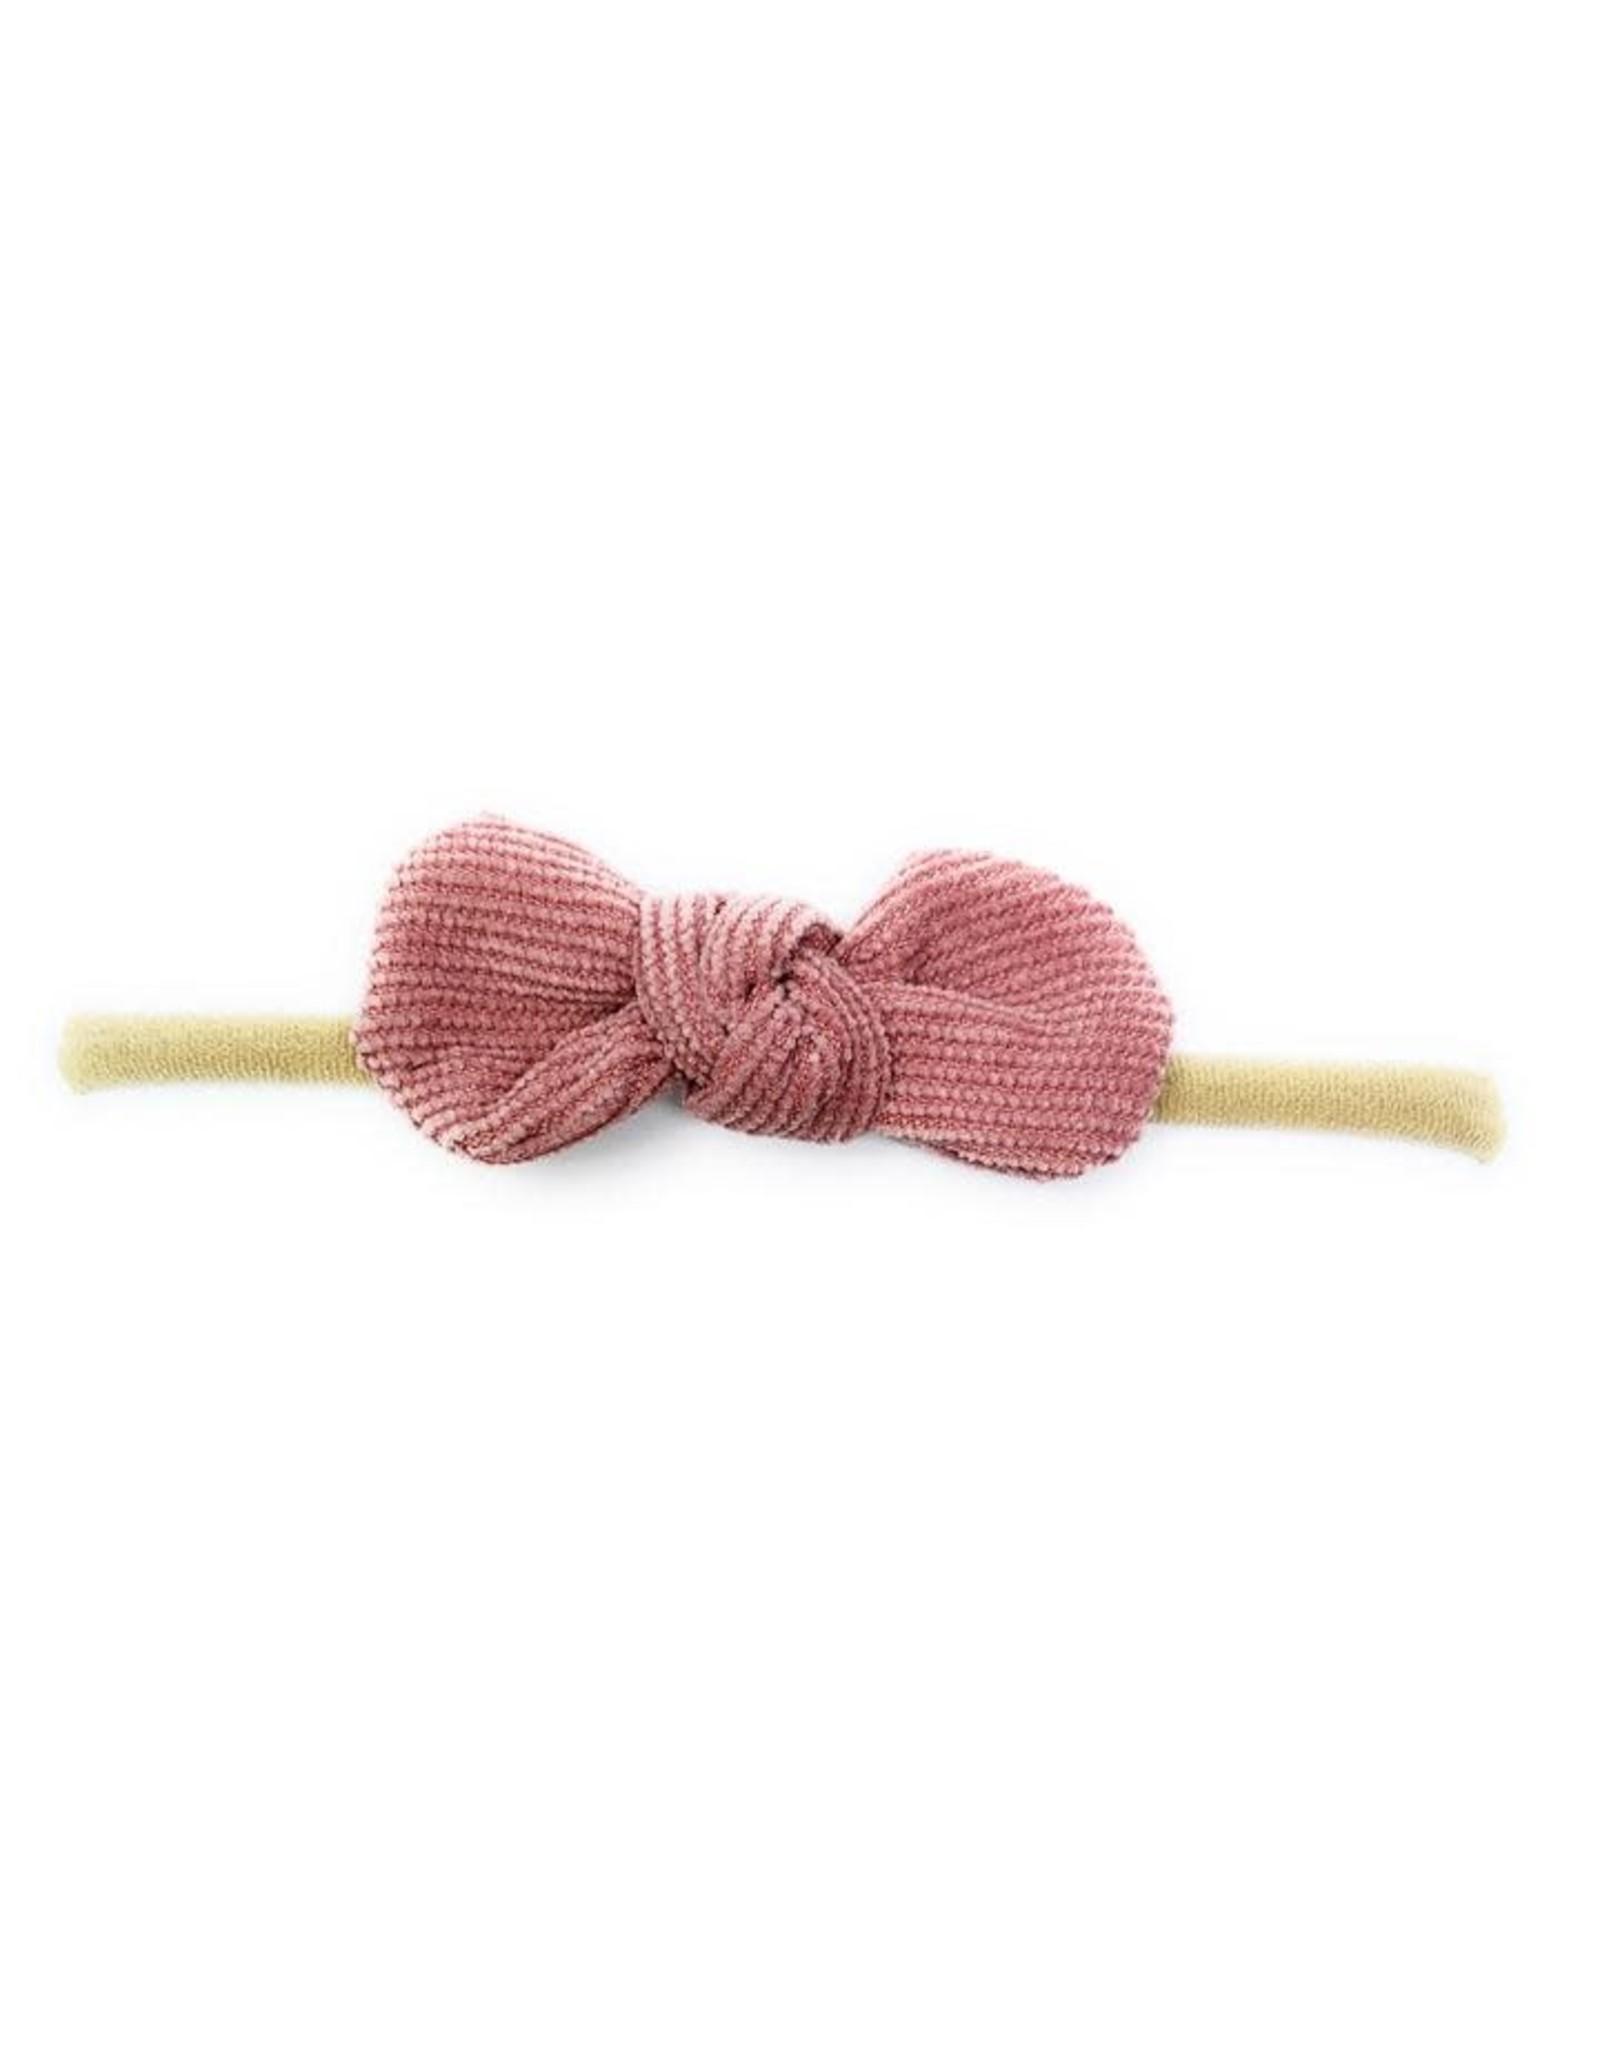 Baby Wisp Babywisp Headband Corduroy Knot, Dusty Rose